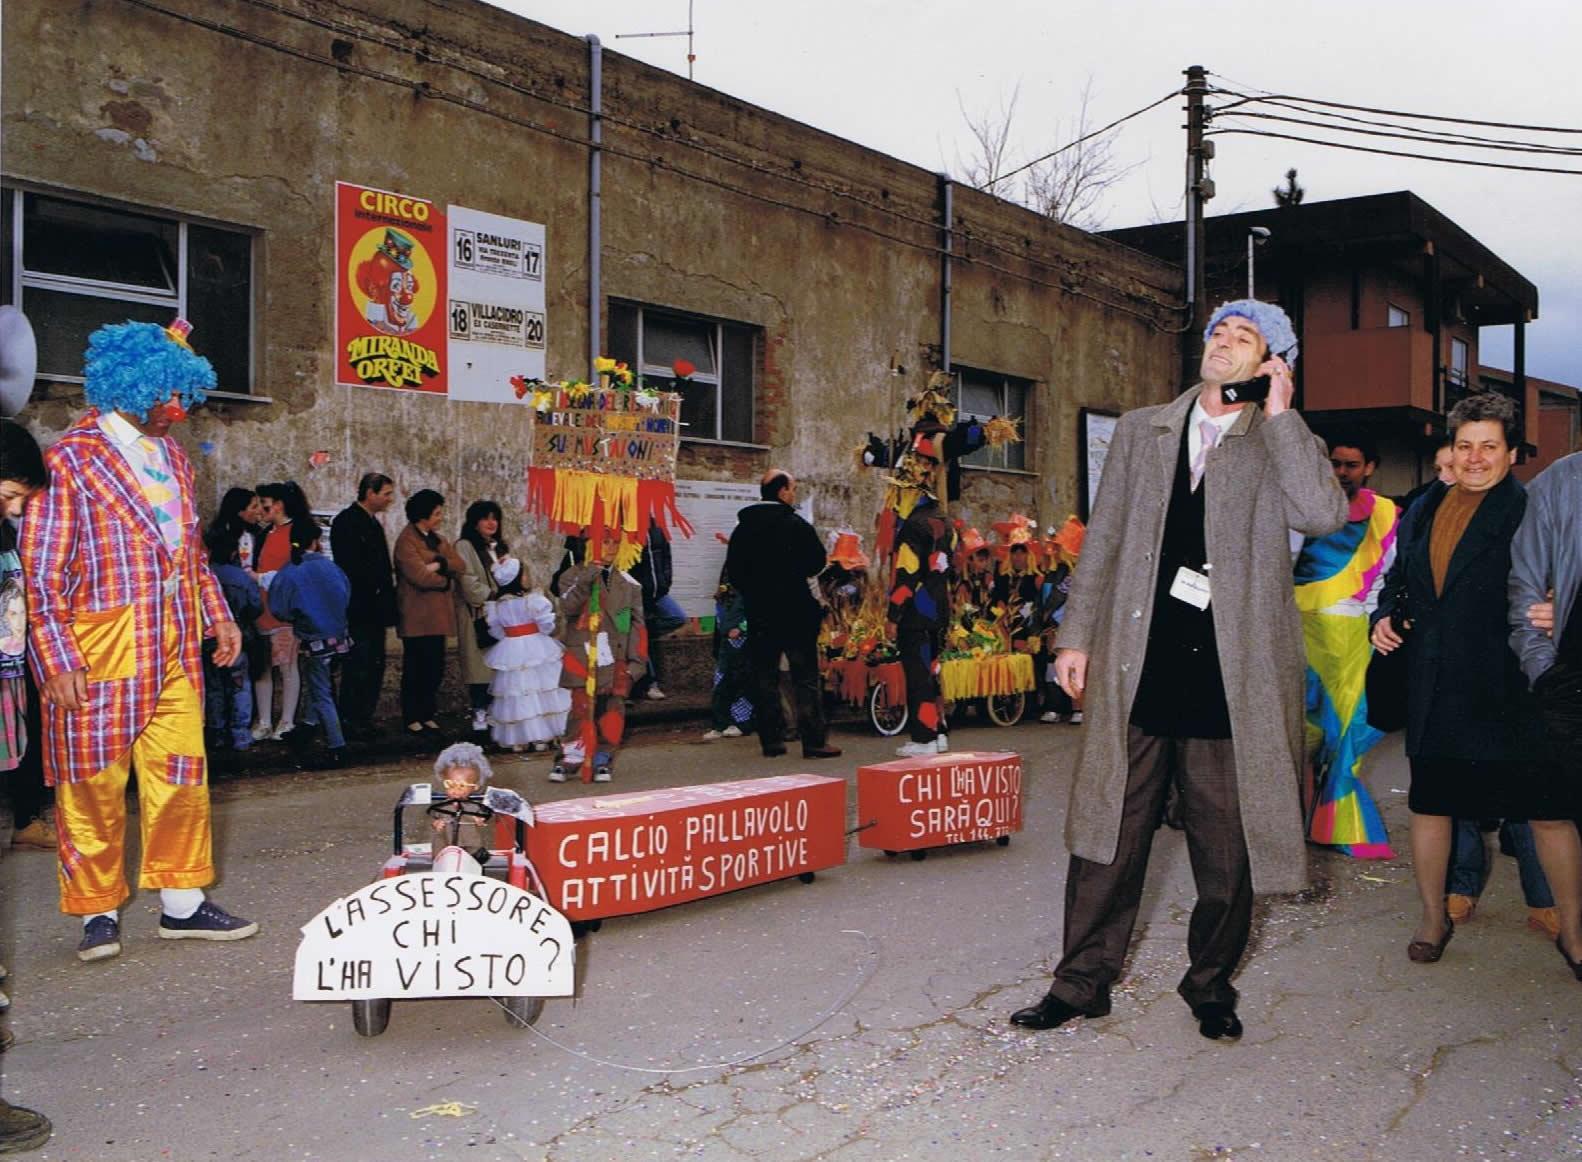 Kikki Pilloni, il calzolaio mascherato